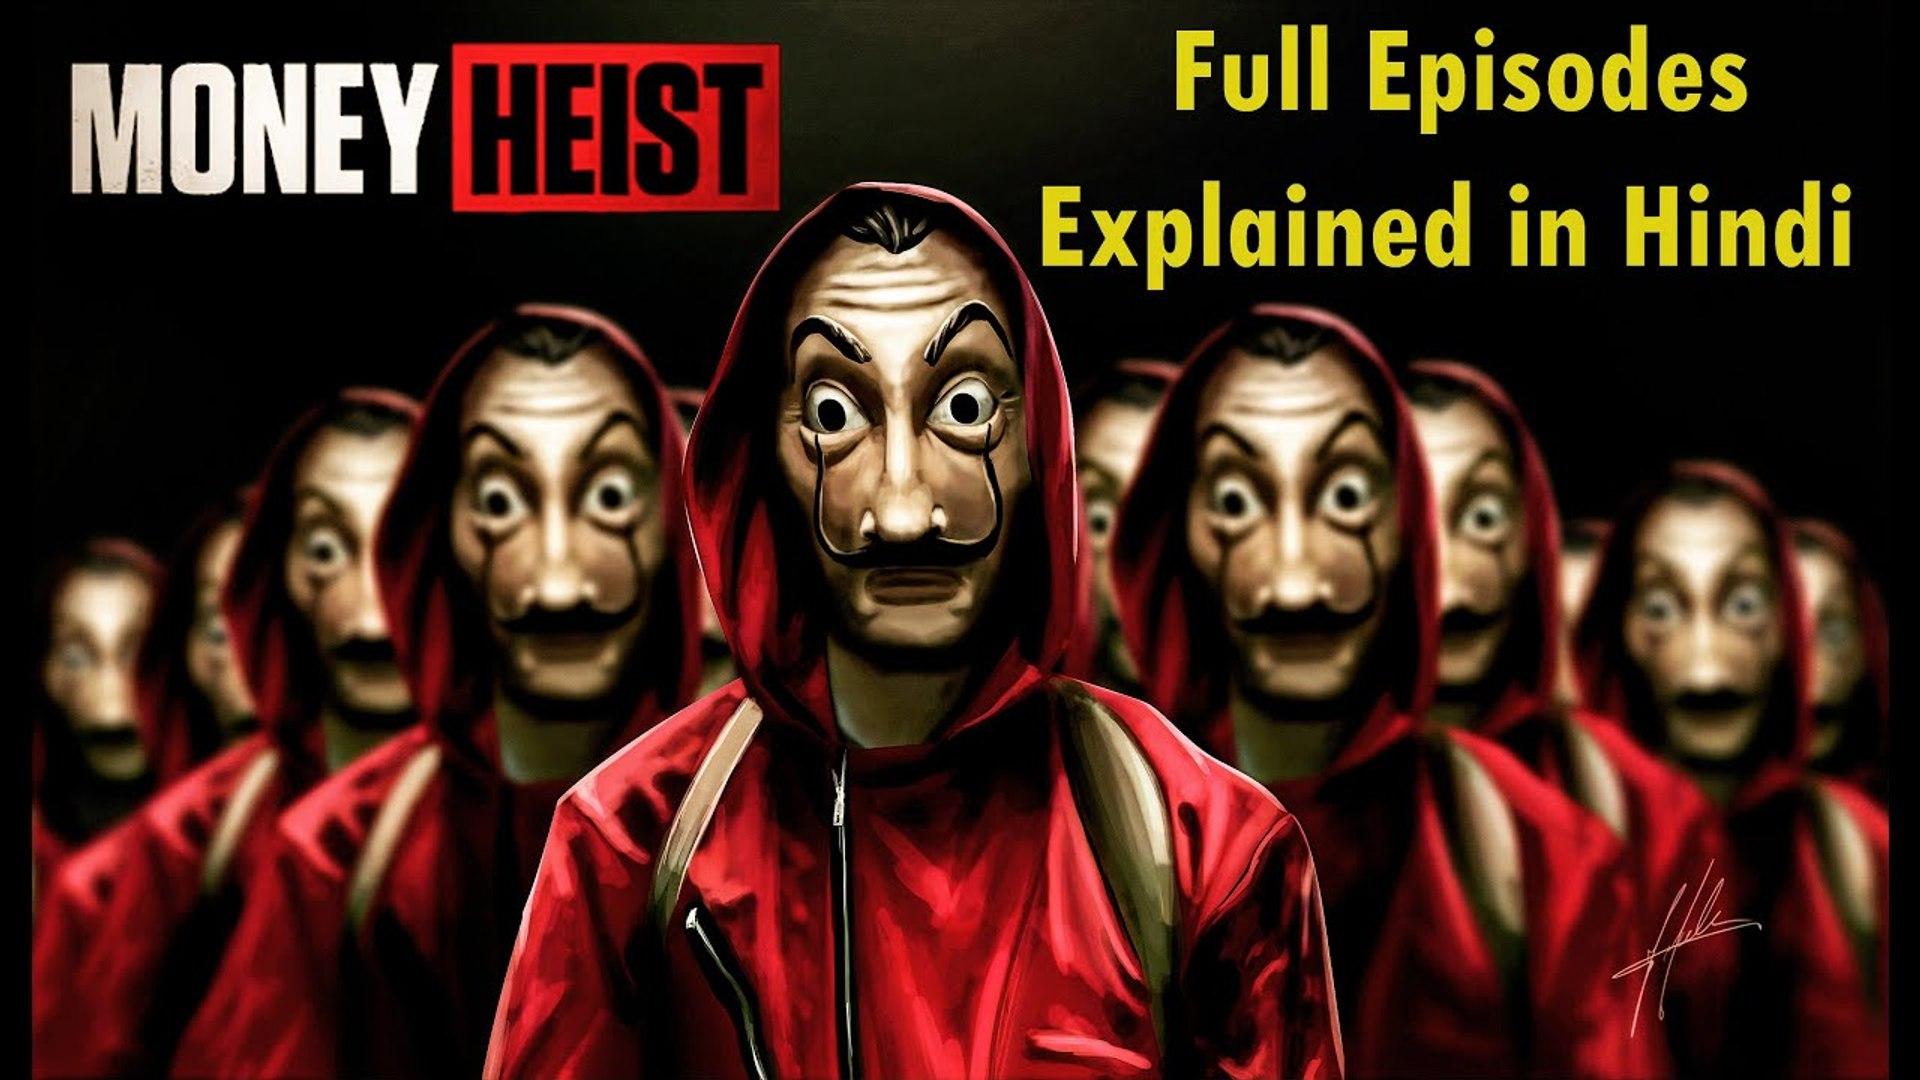 Money Heist Season 1 Explained in Hindi - Lacasa De Pappel Season 1 Explained  Hindi Detailed - Netflix 2020 - video dailymotion